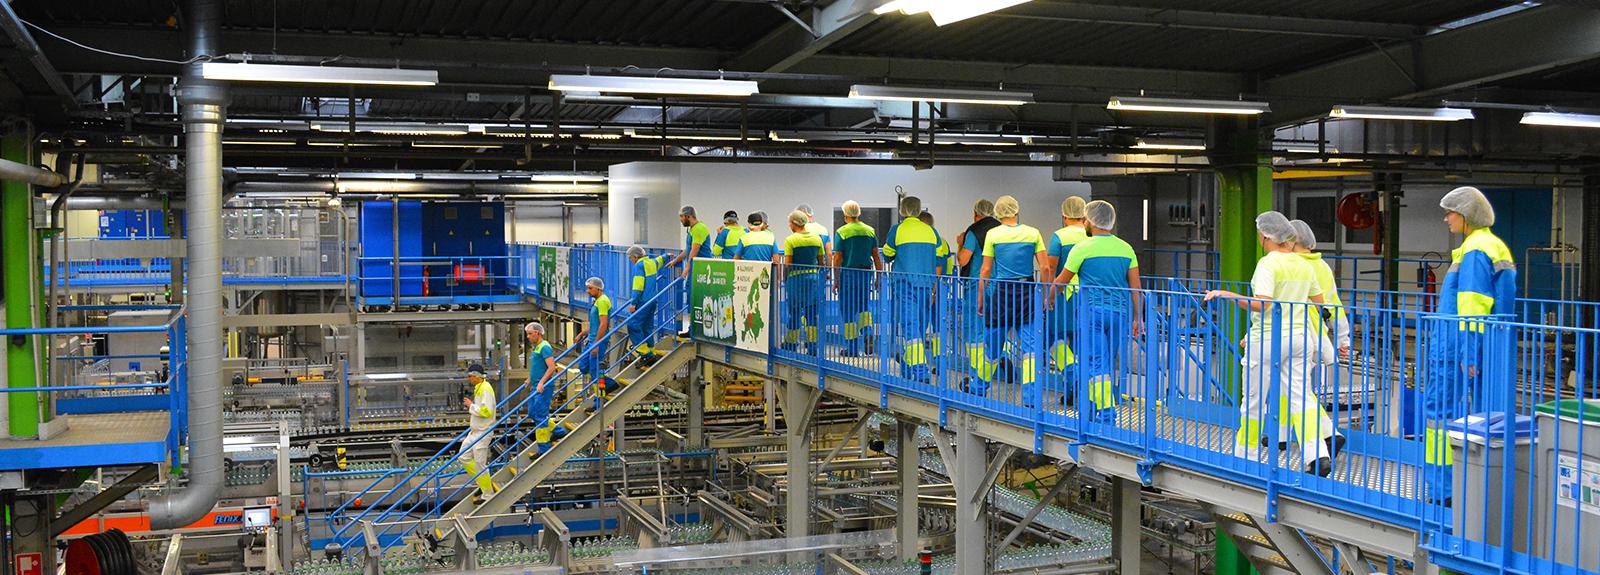 Exploring the Volvic factory